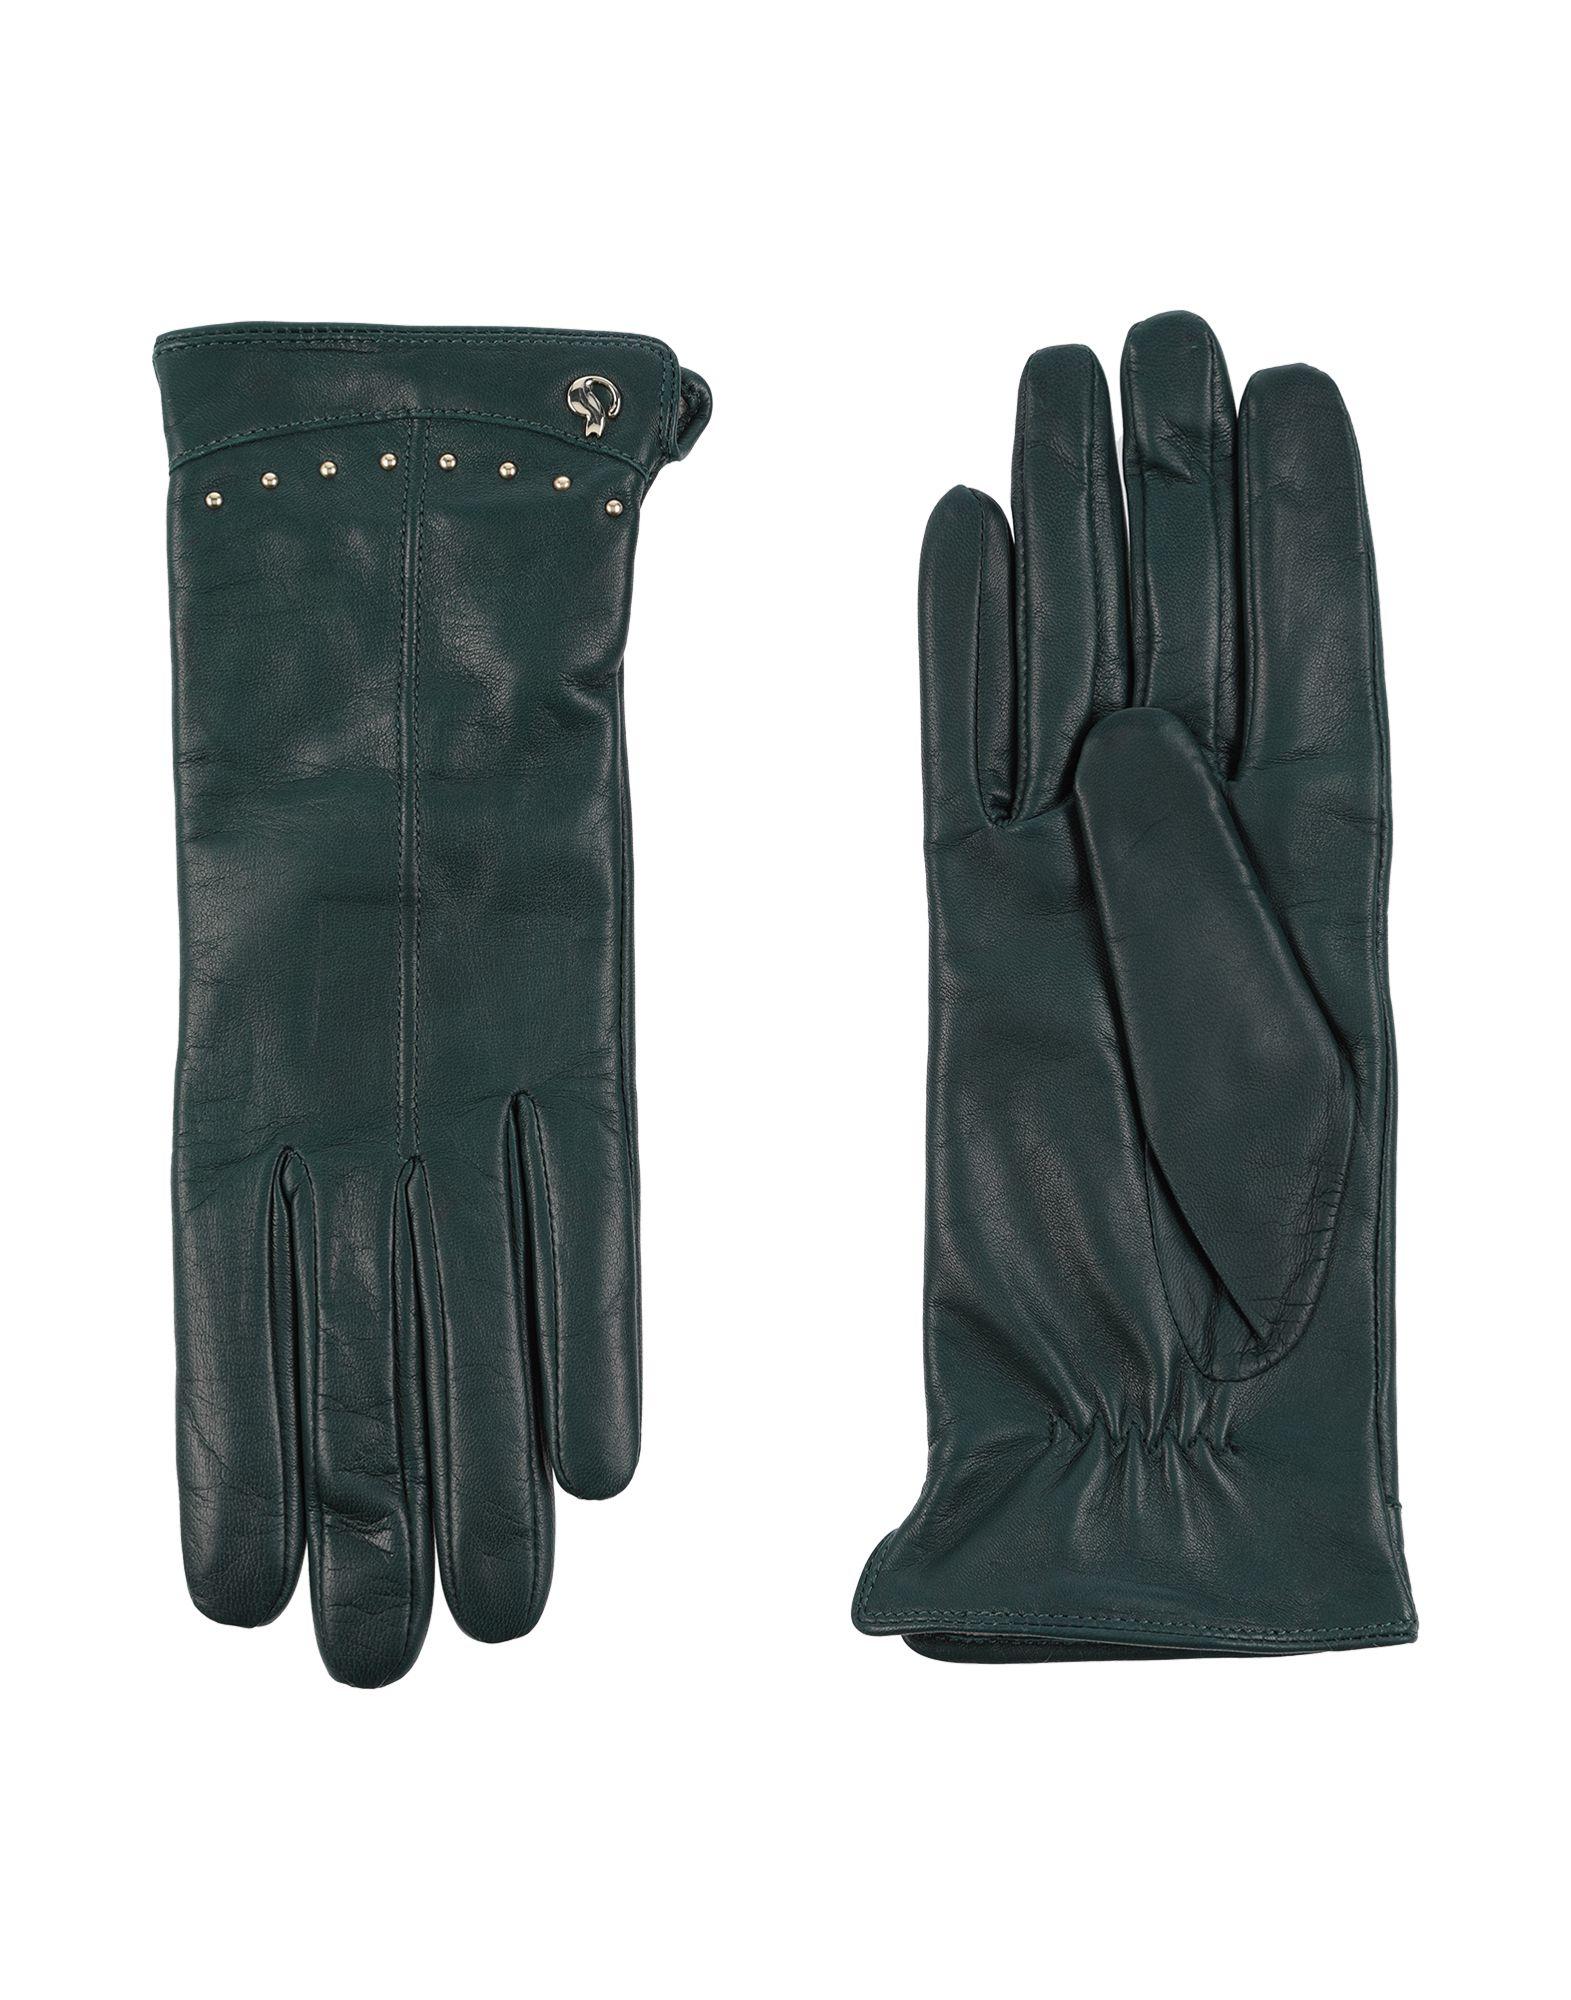 DAL DOSSO® Перчатки стрельба из лука защитите перчатки 3 пальцы тянуть поклон стрелка кожа съемки перчатки